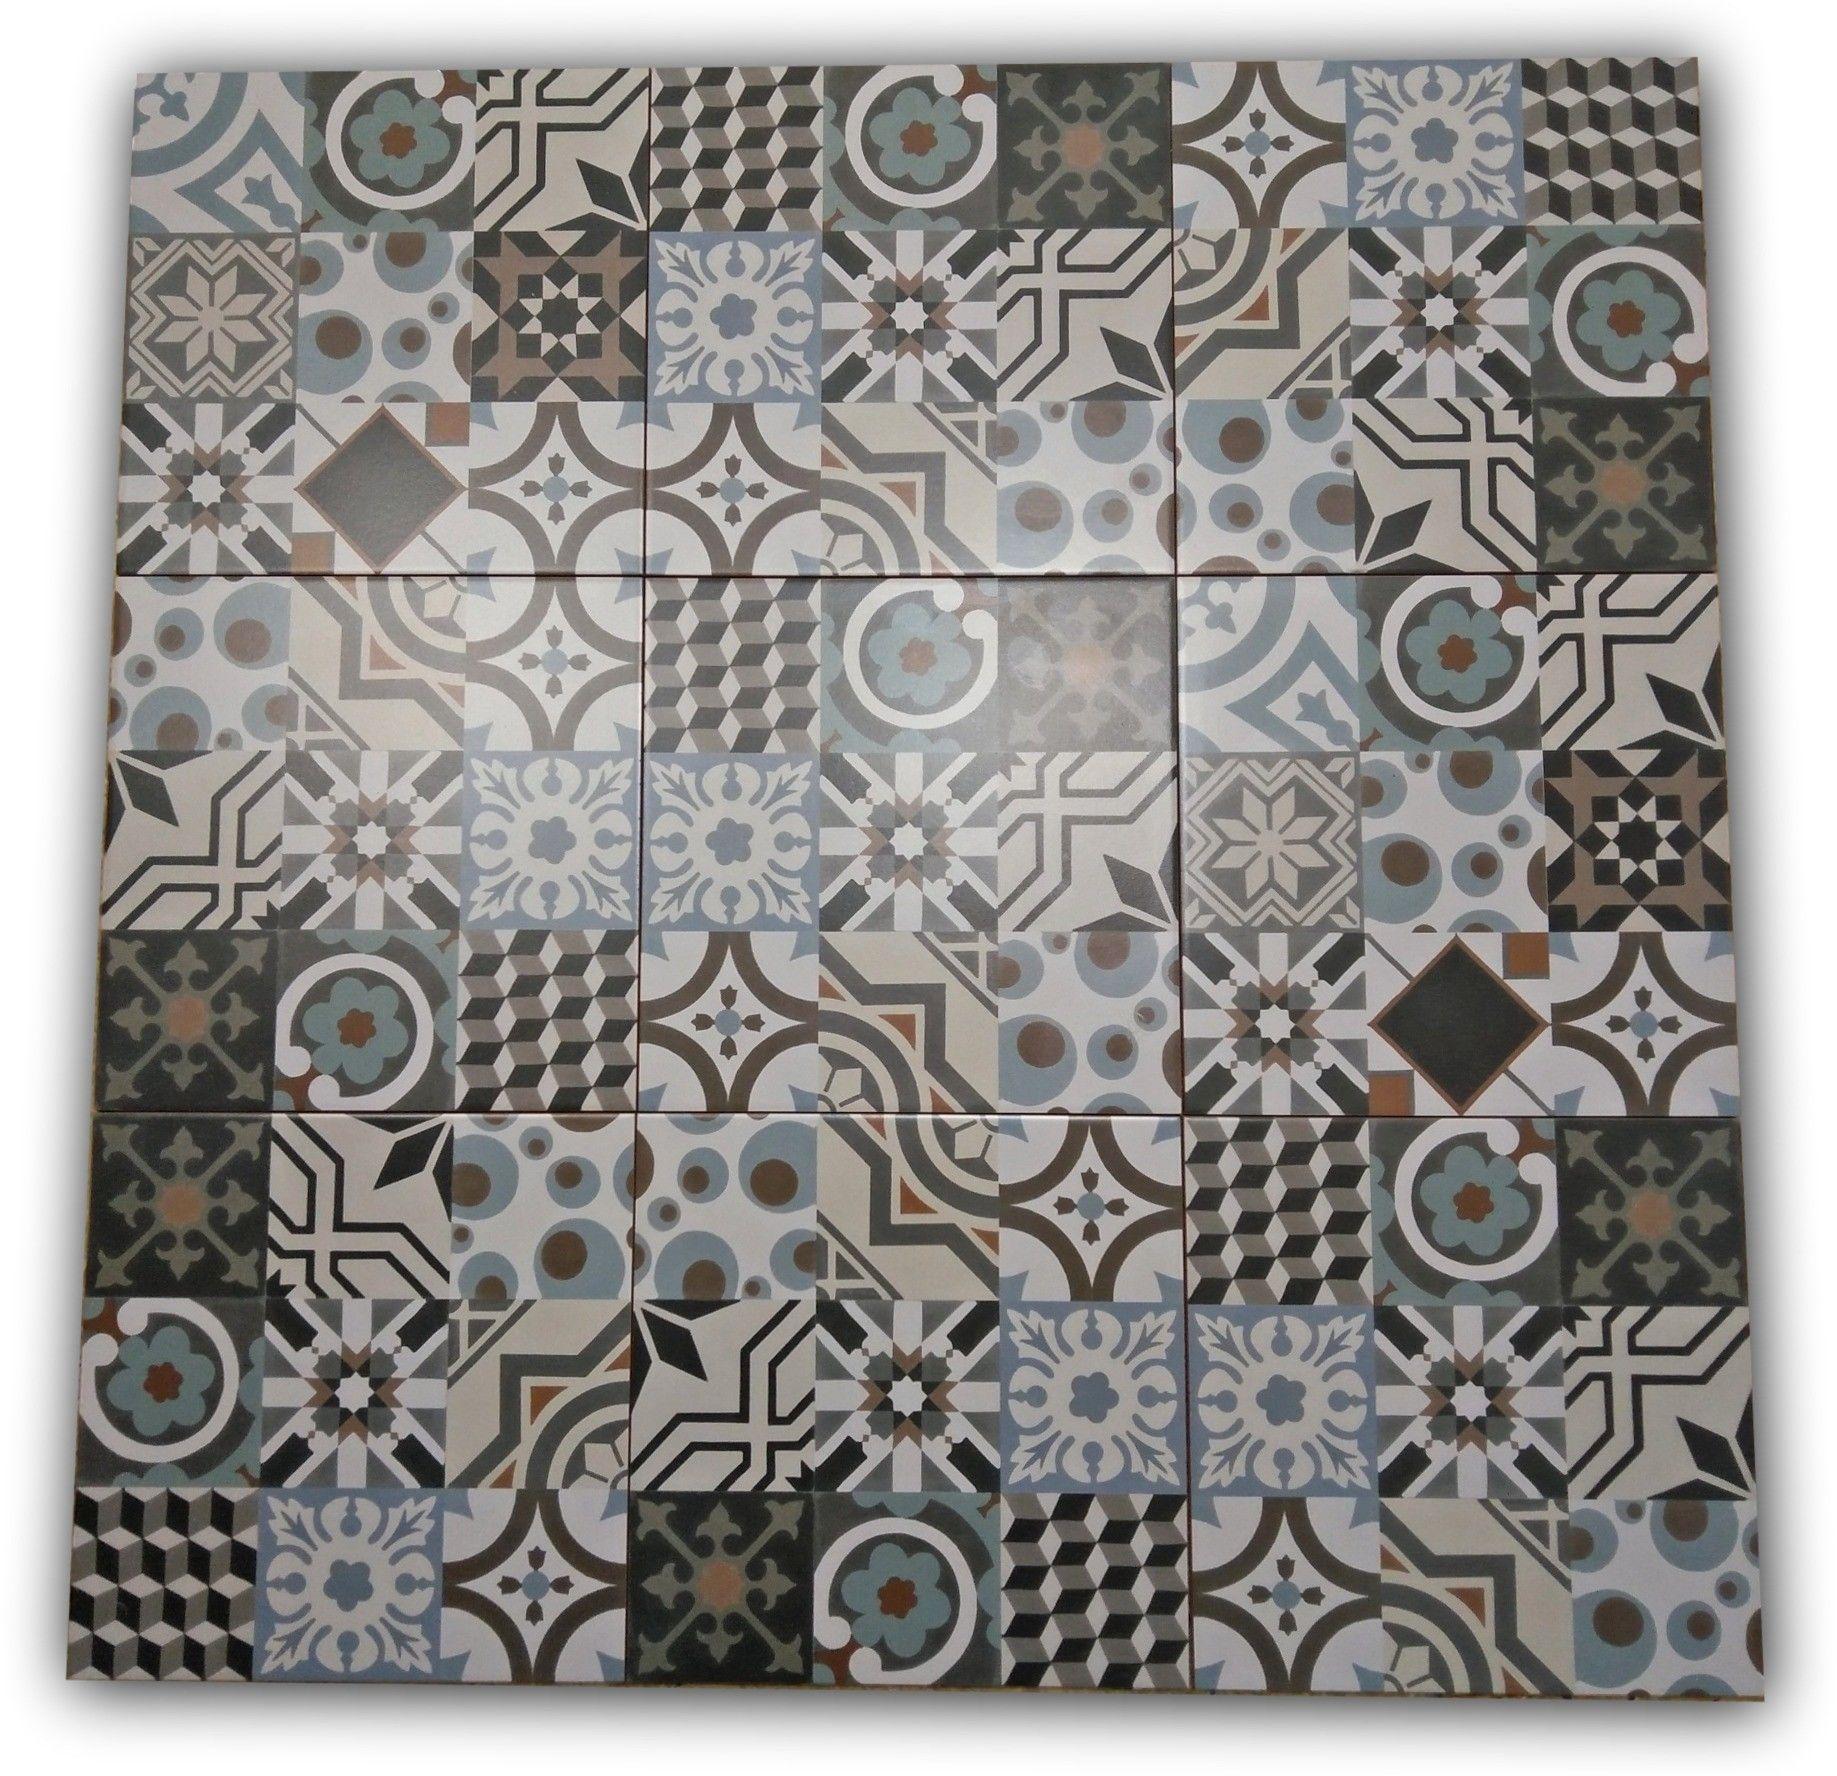 Barcelona 33,2x33,2 płytki patchwork